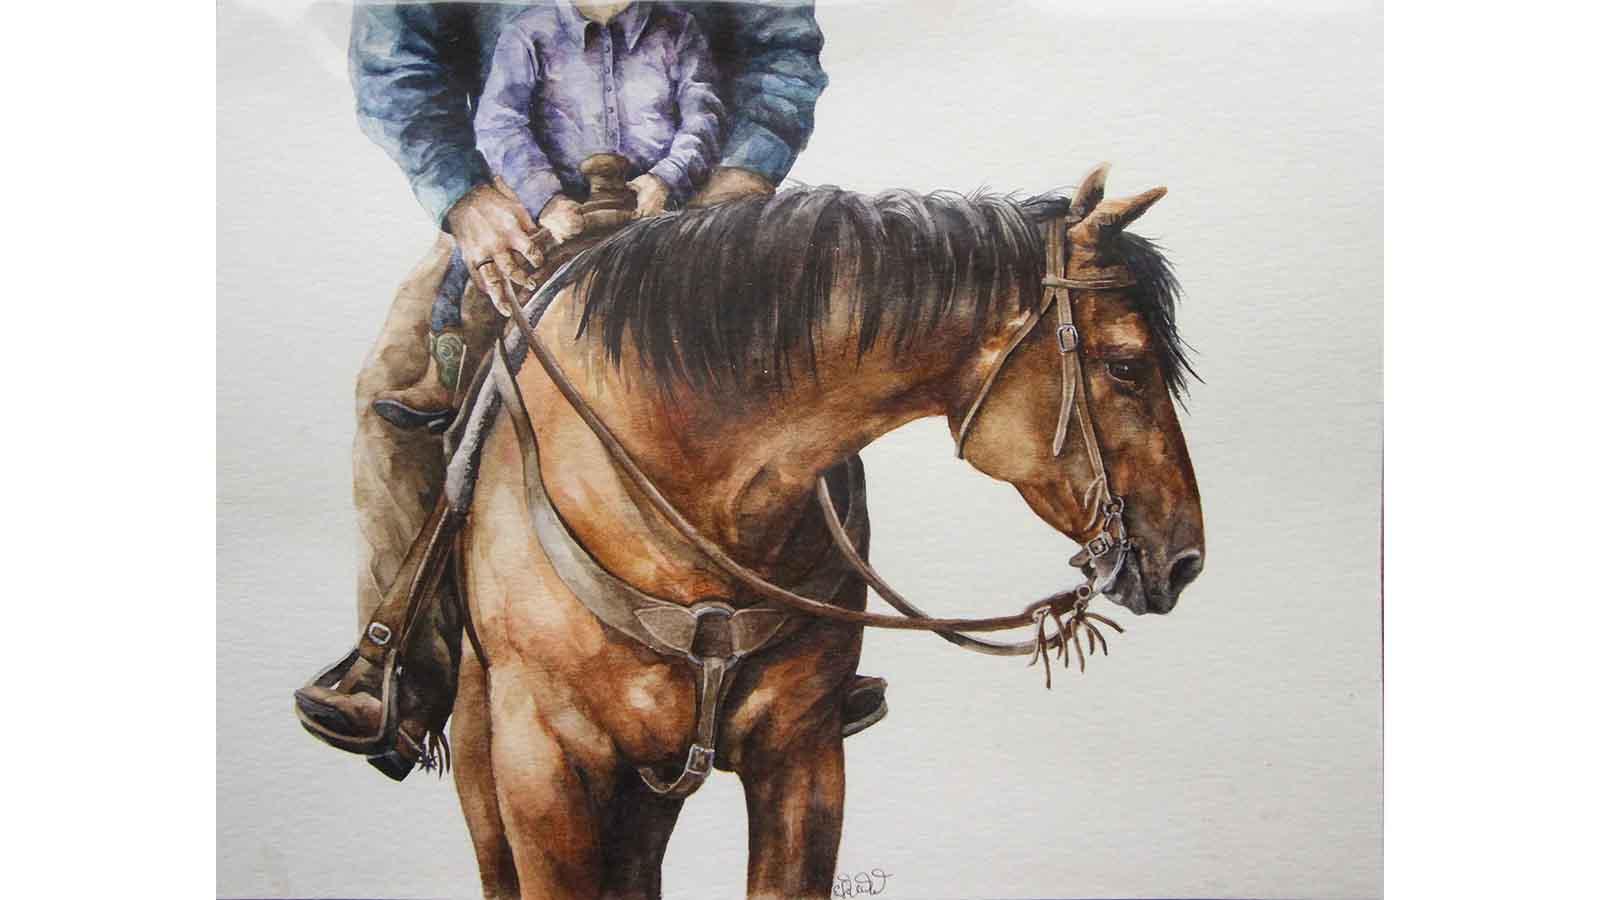 Raising a Cowboy by Emma Vand de Voort